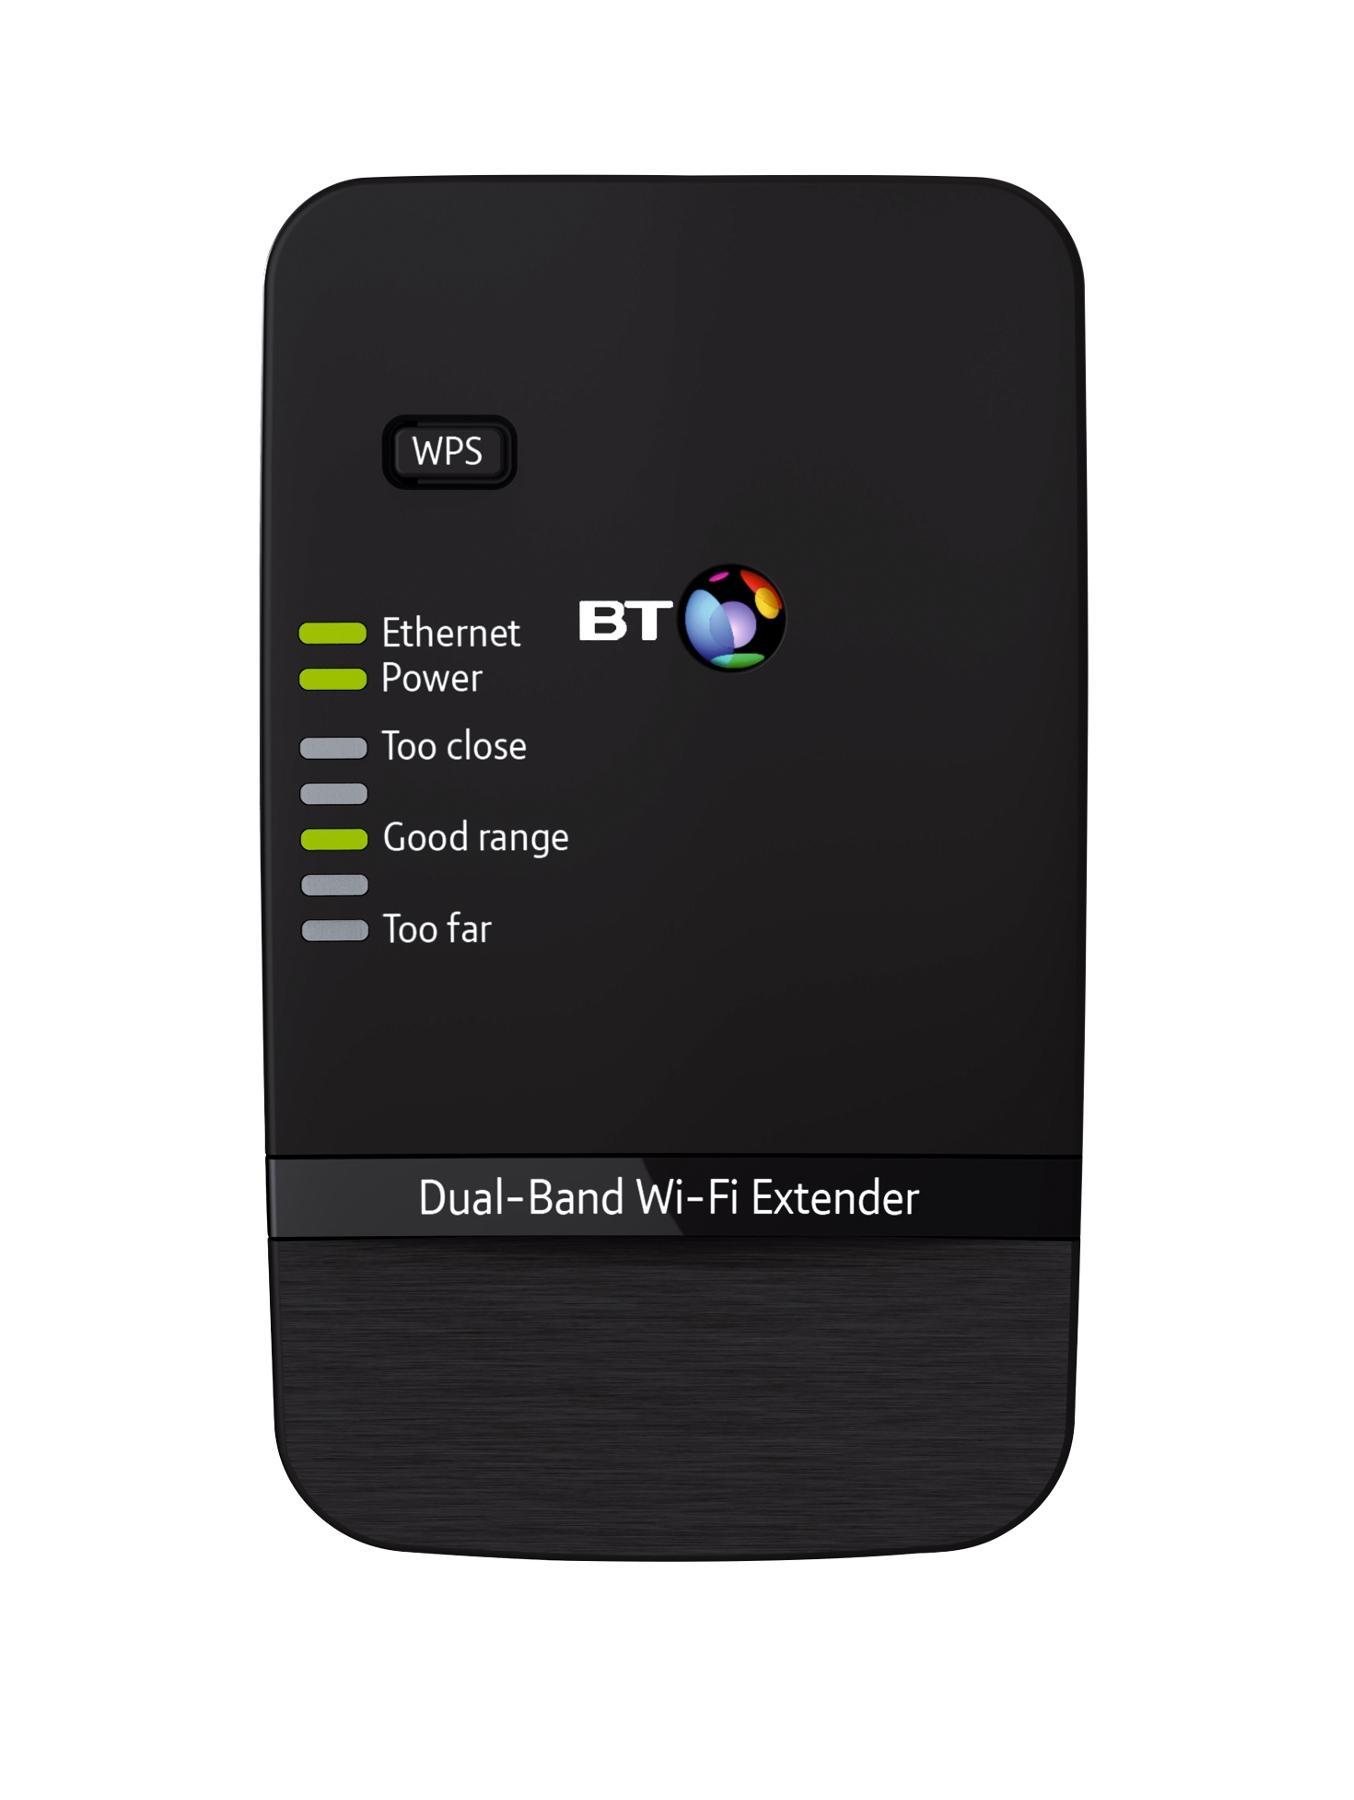 BT Dual-Band Wi-Fi Extender 600 - Black